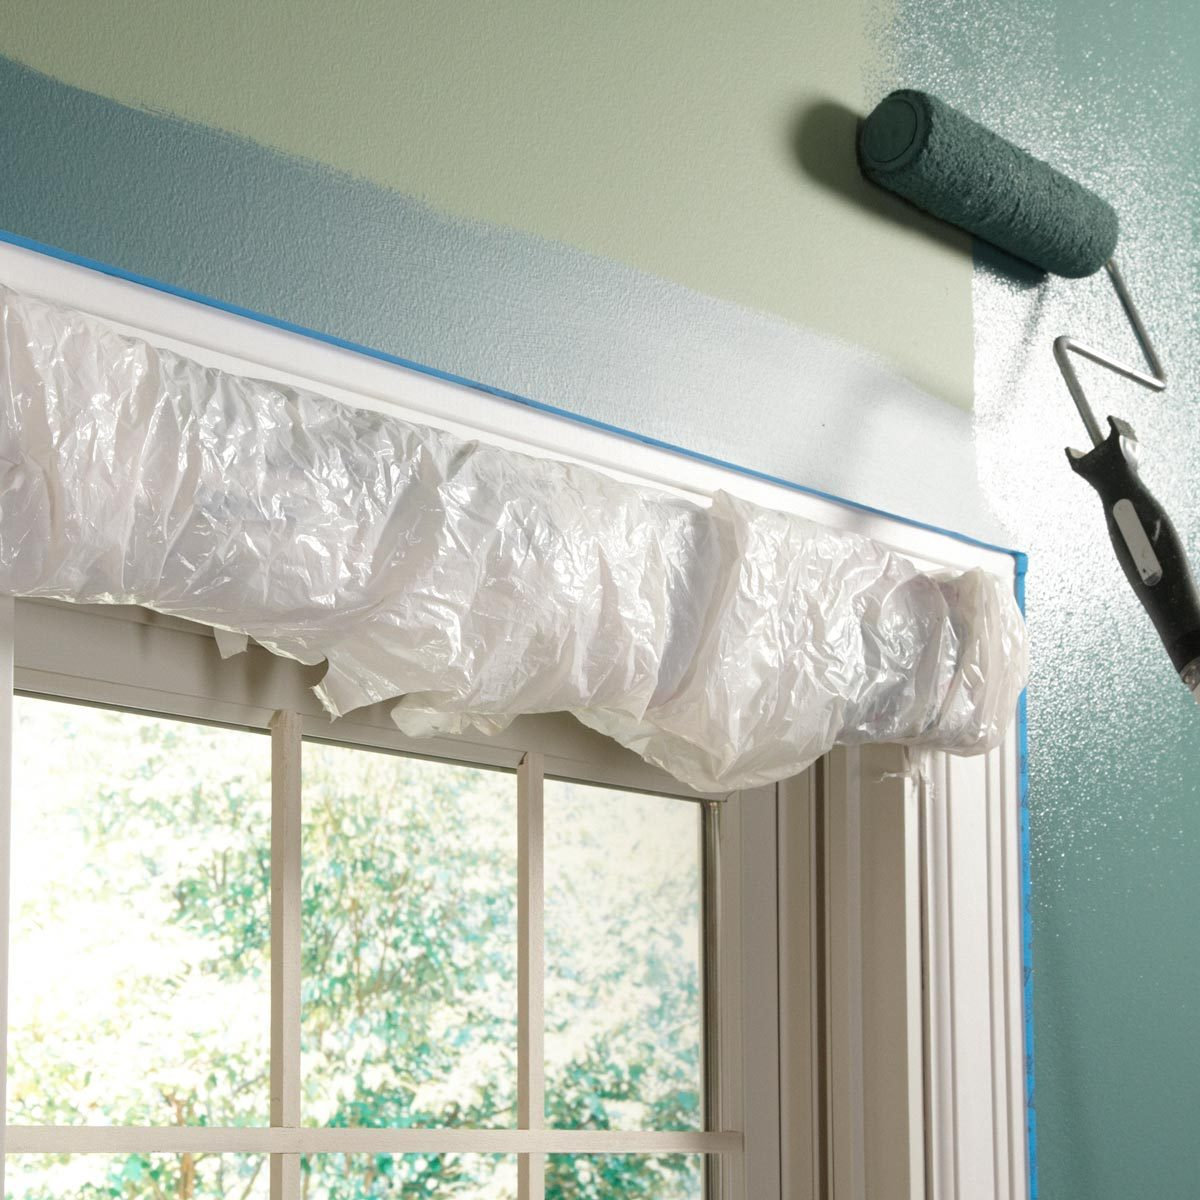 splatter-proof window treatments | the family handyman